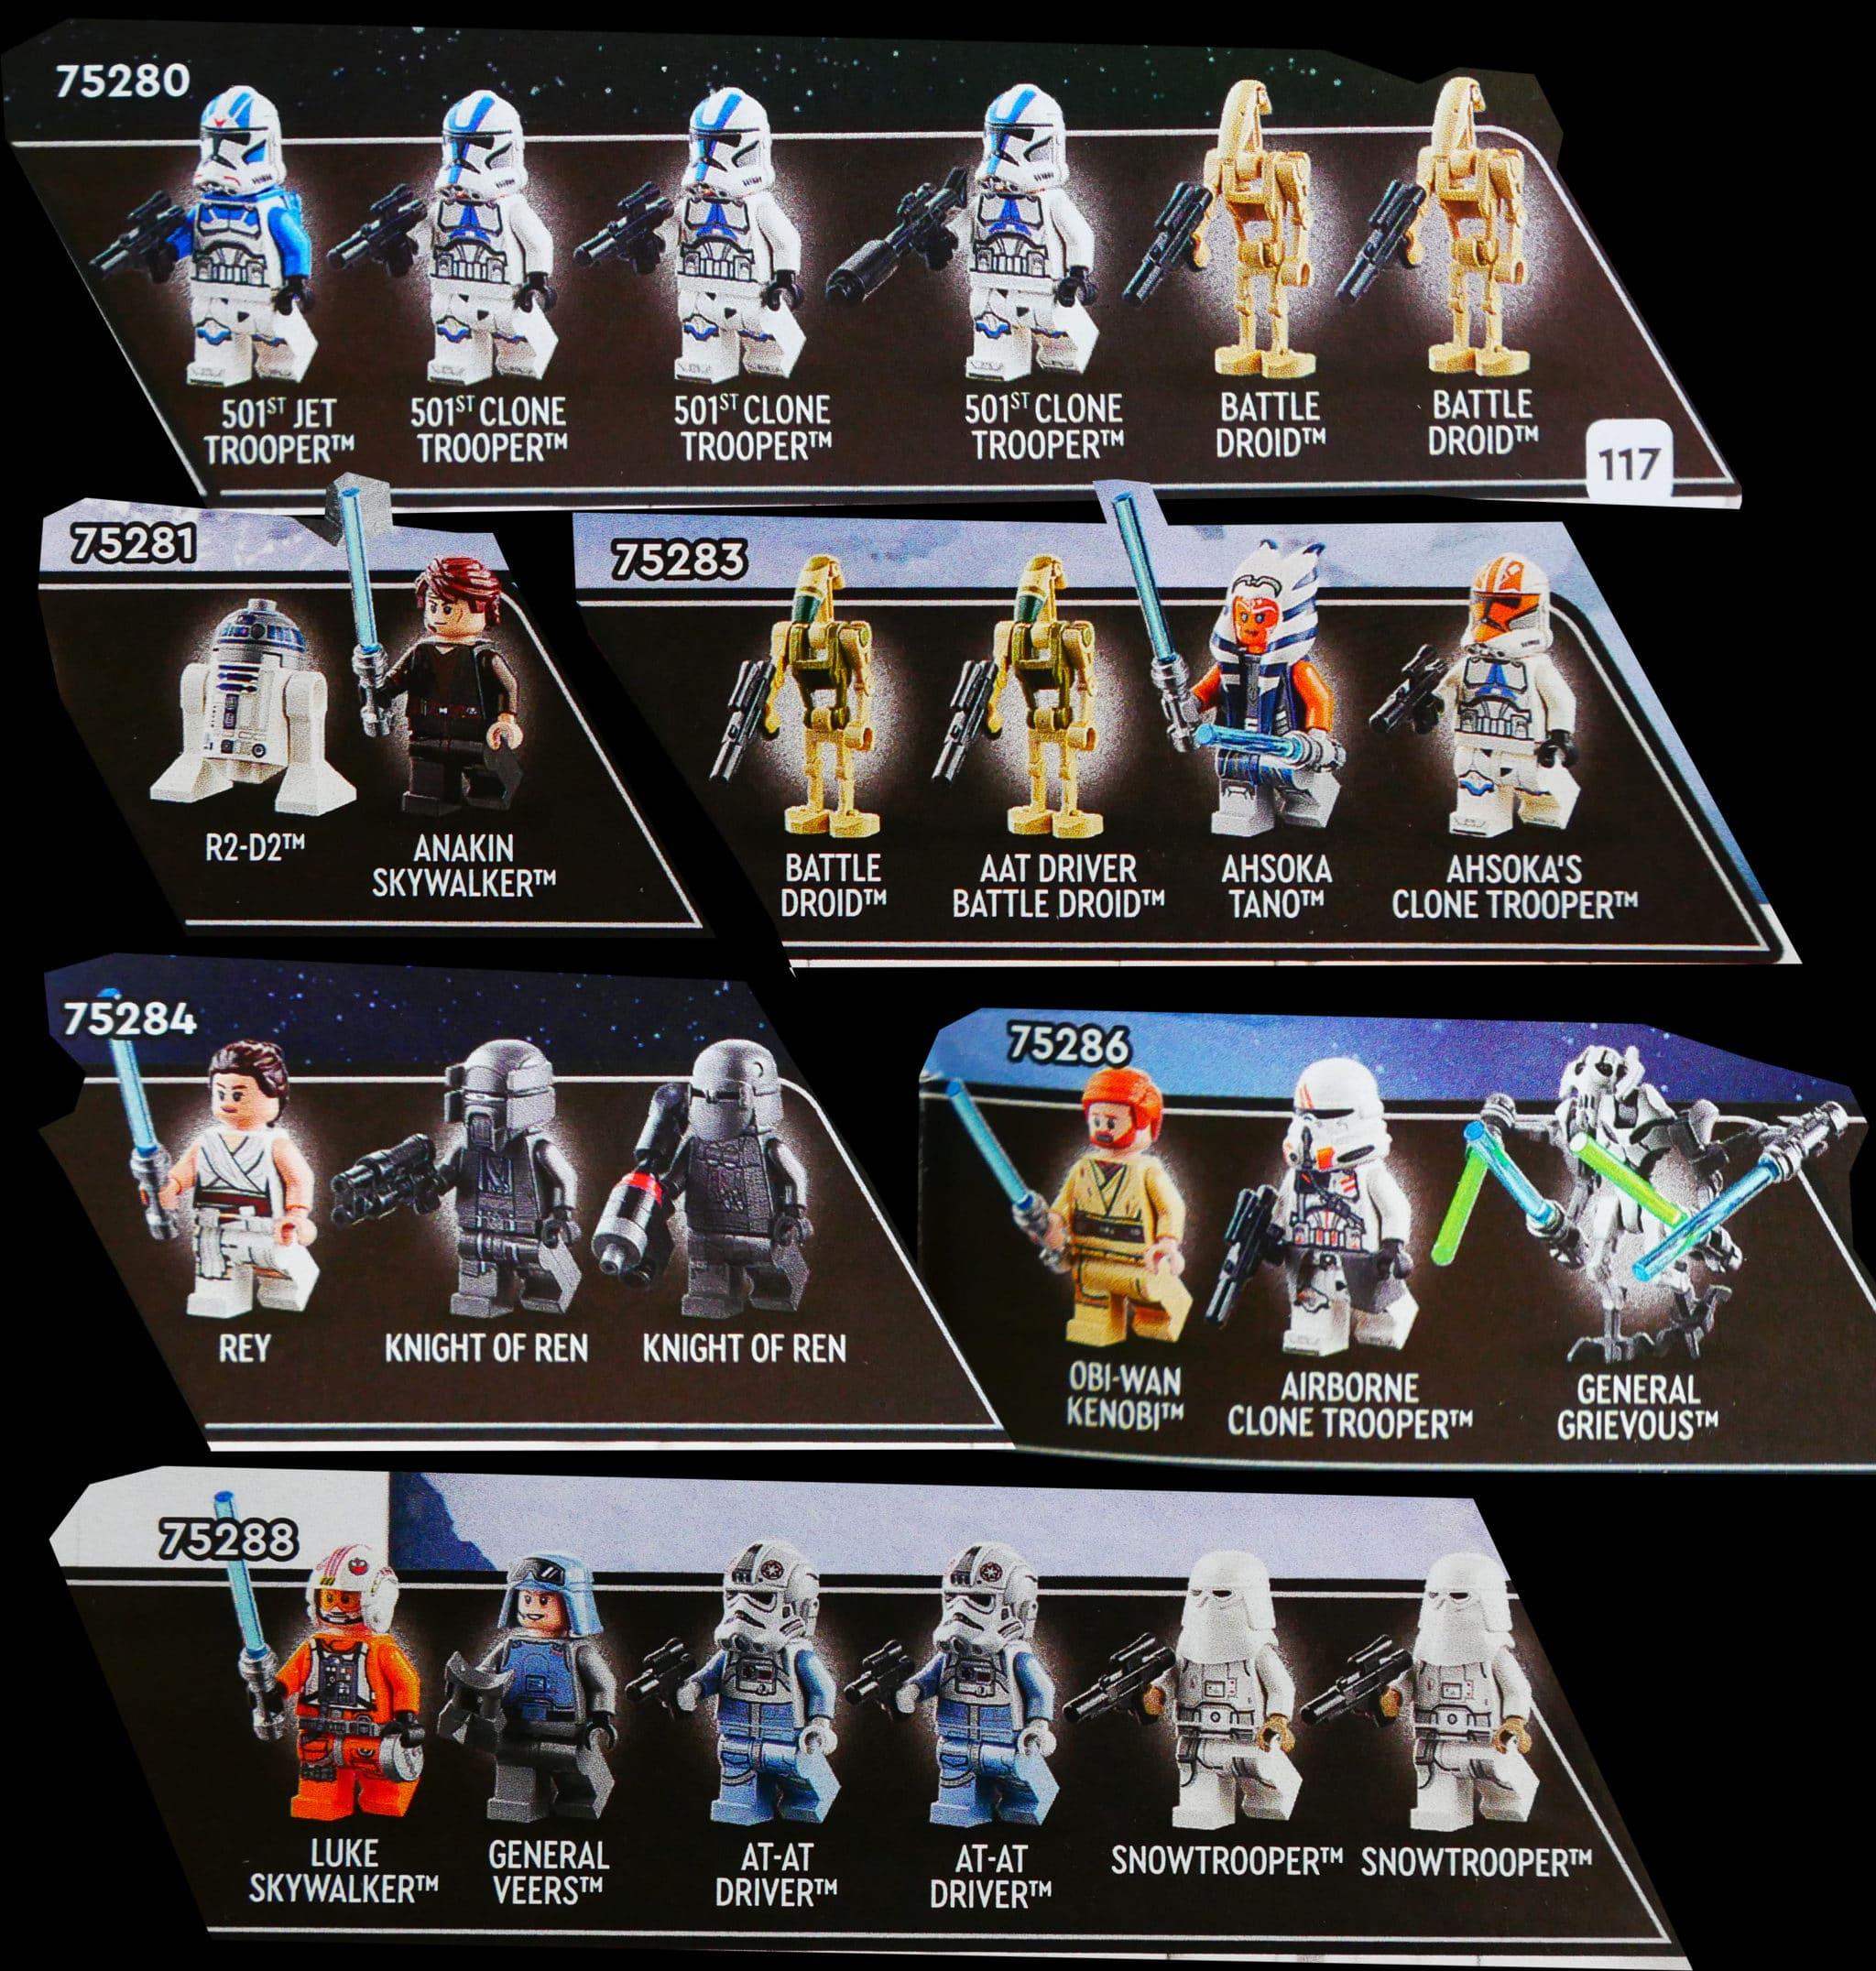 LEGO Star Wars August 2020 Minifiguren